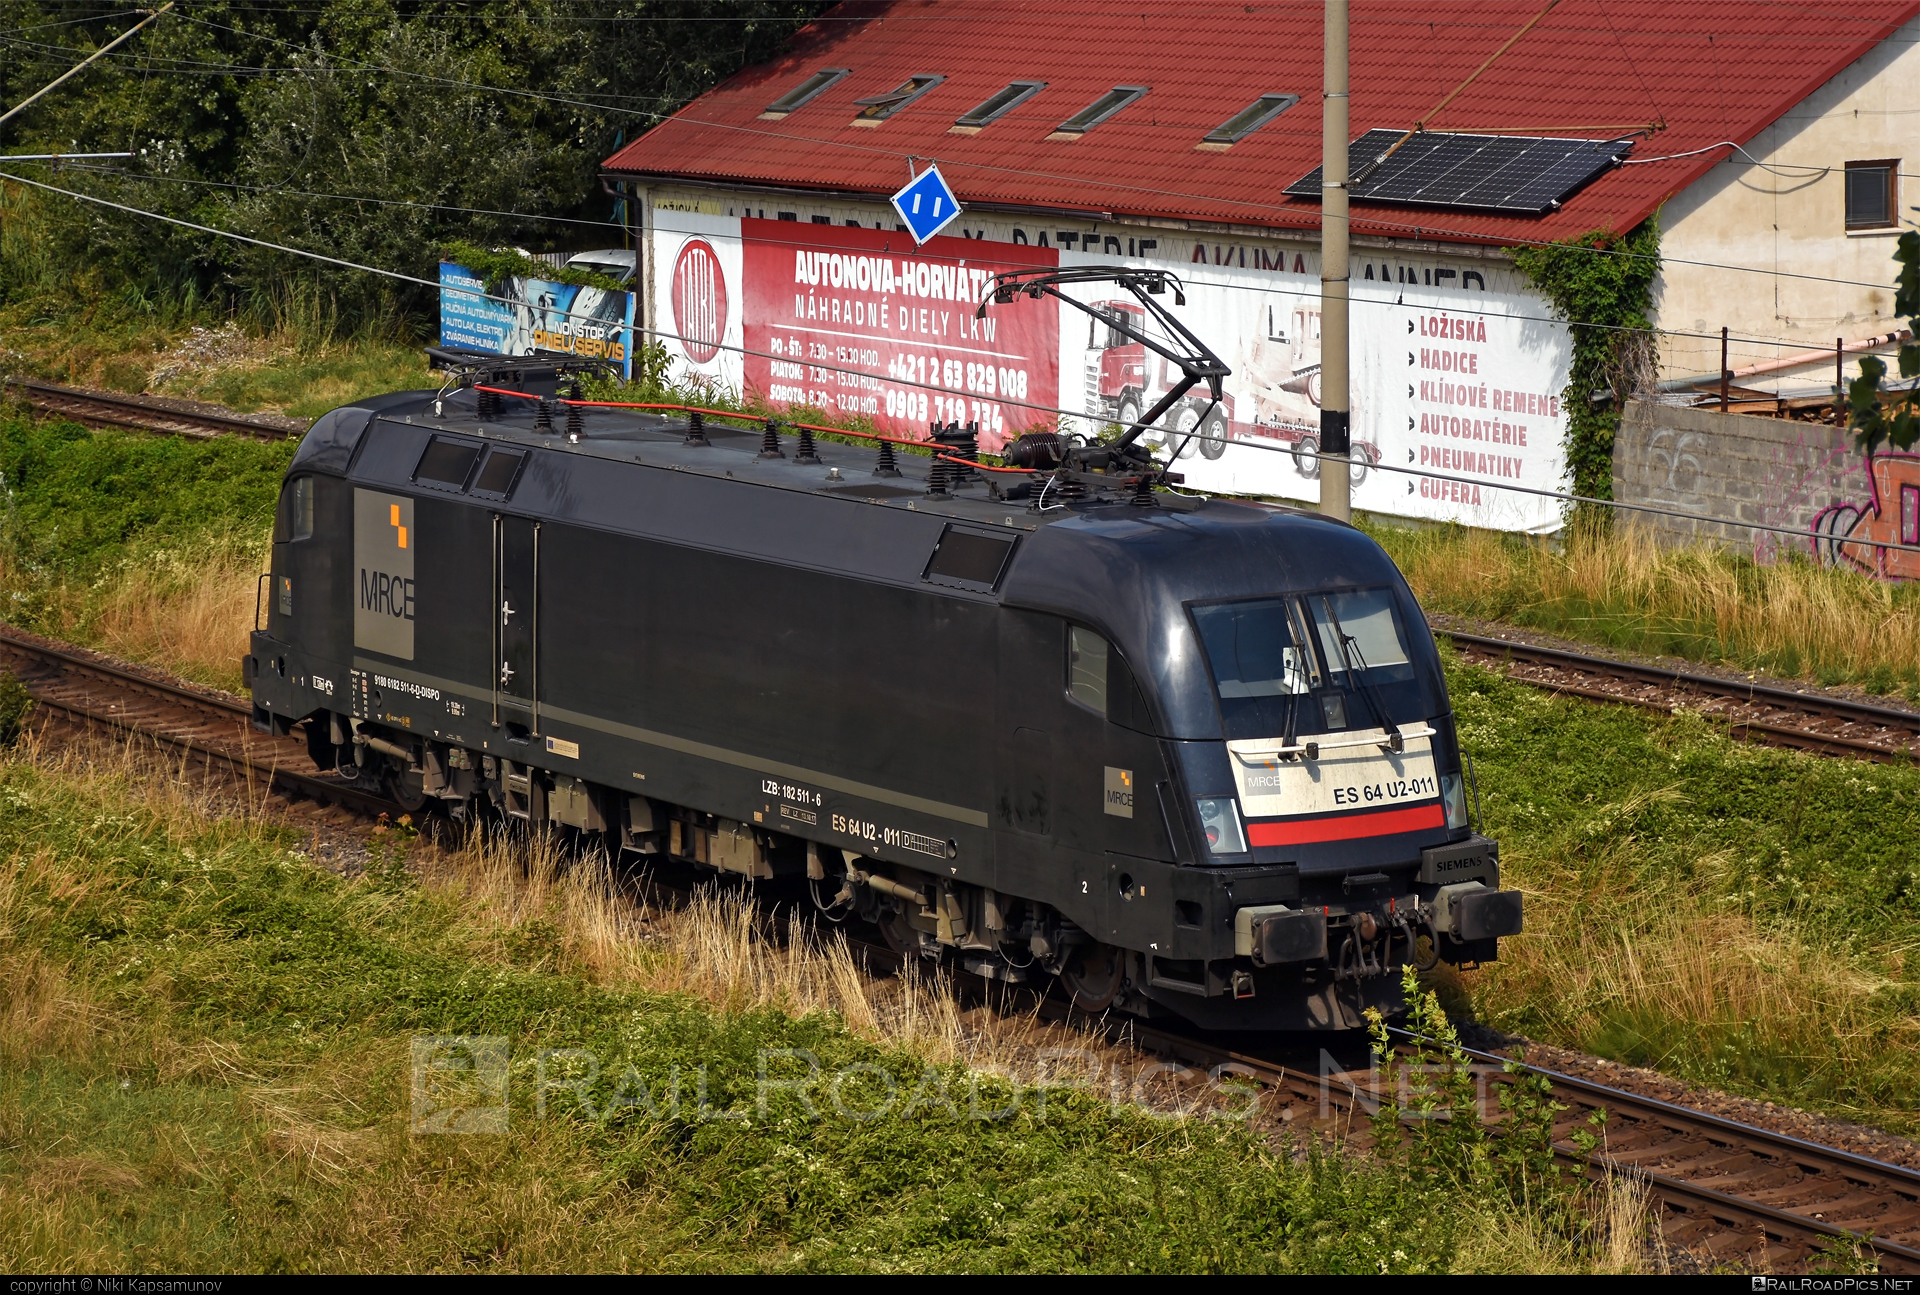 Siemens ES 64 U2 - 182 511-6 operated by Steiermarkbahn Transport & Logistik GmbH #dispolok #es64 #es64u #es64u2 #eurosprinter #mitsuirailcapitaleurope #mitsuirailcapitaleuropegmbh #mrce #siemens #siemenses64 #siemenses64u #siemenses64u2 #siemenstaurus #stb #steiermarkbahn #taurus #tauruslocomotive